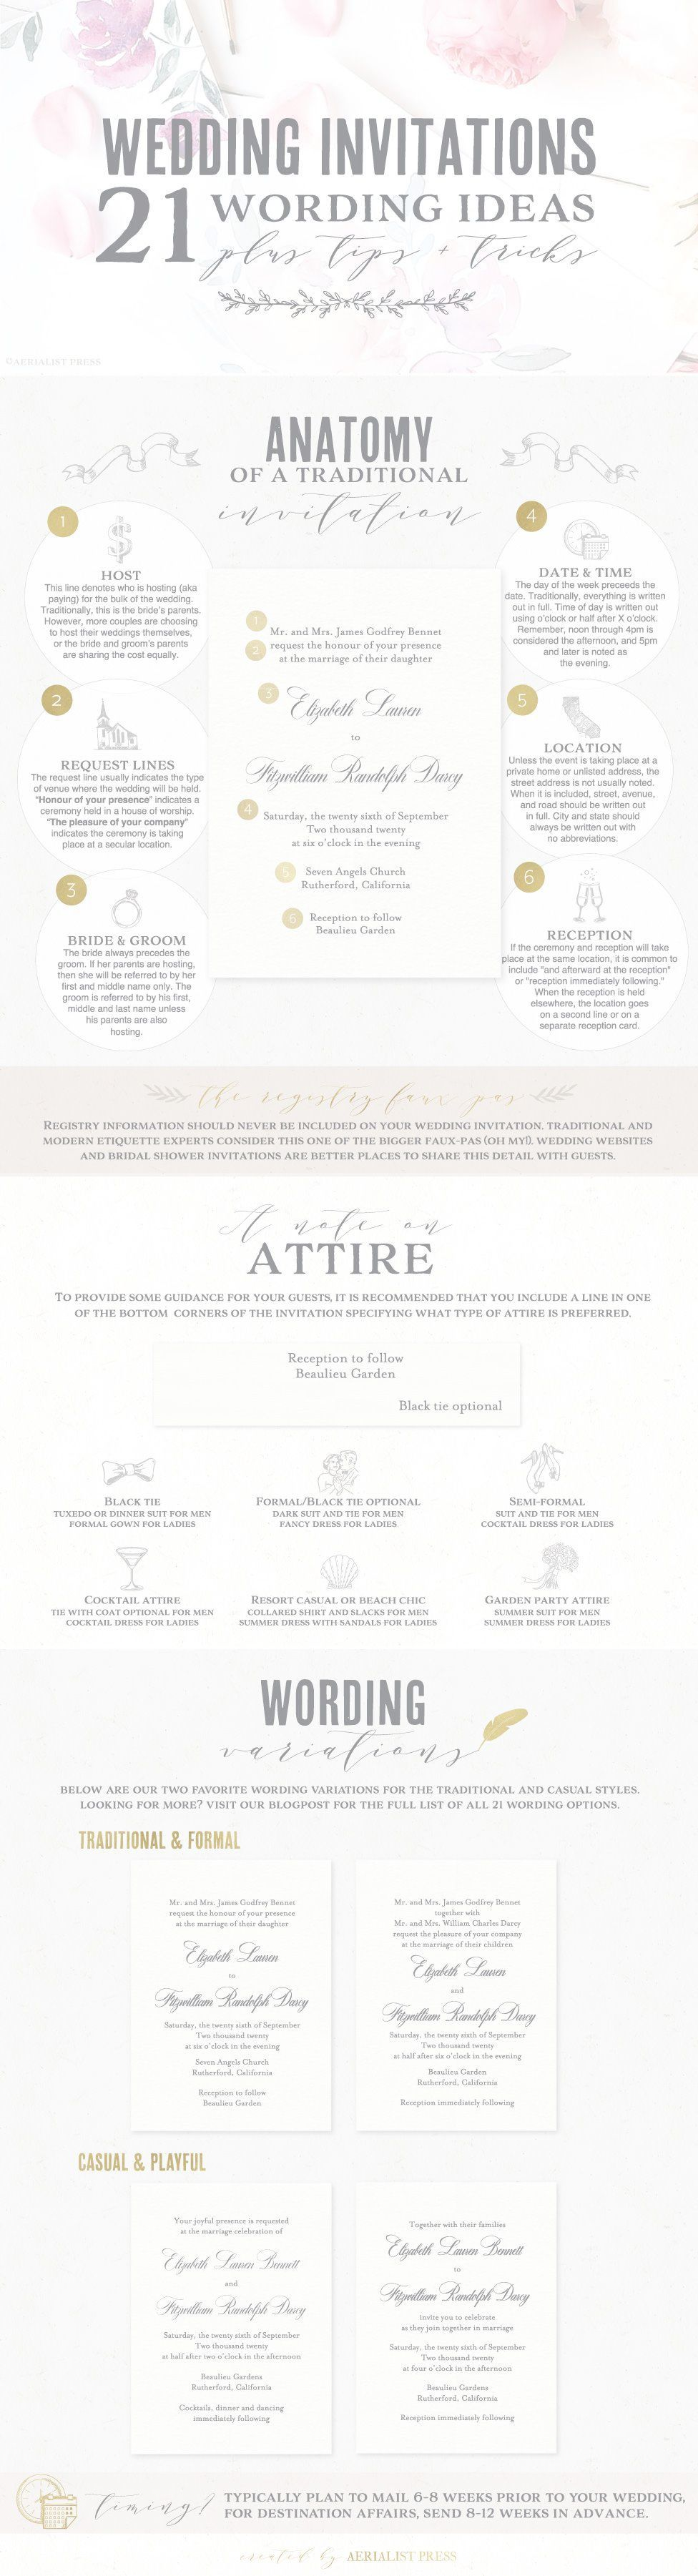 Traditional Wedding Invitations Philippines Diy Wedding Invitations